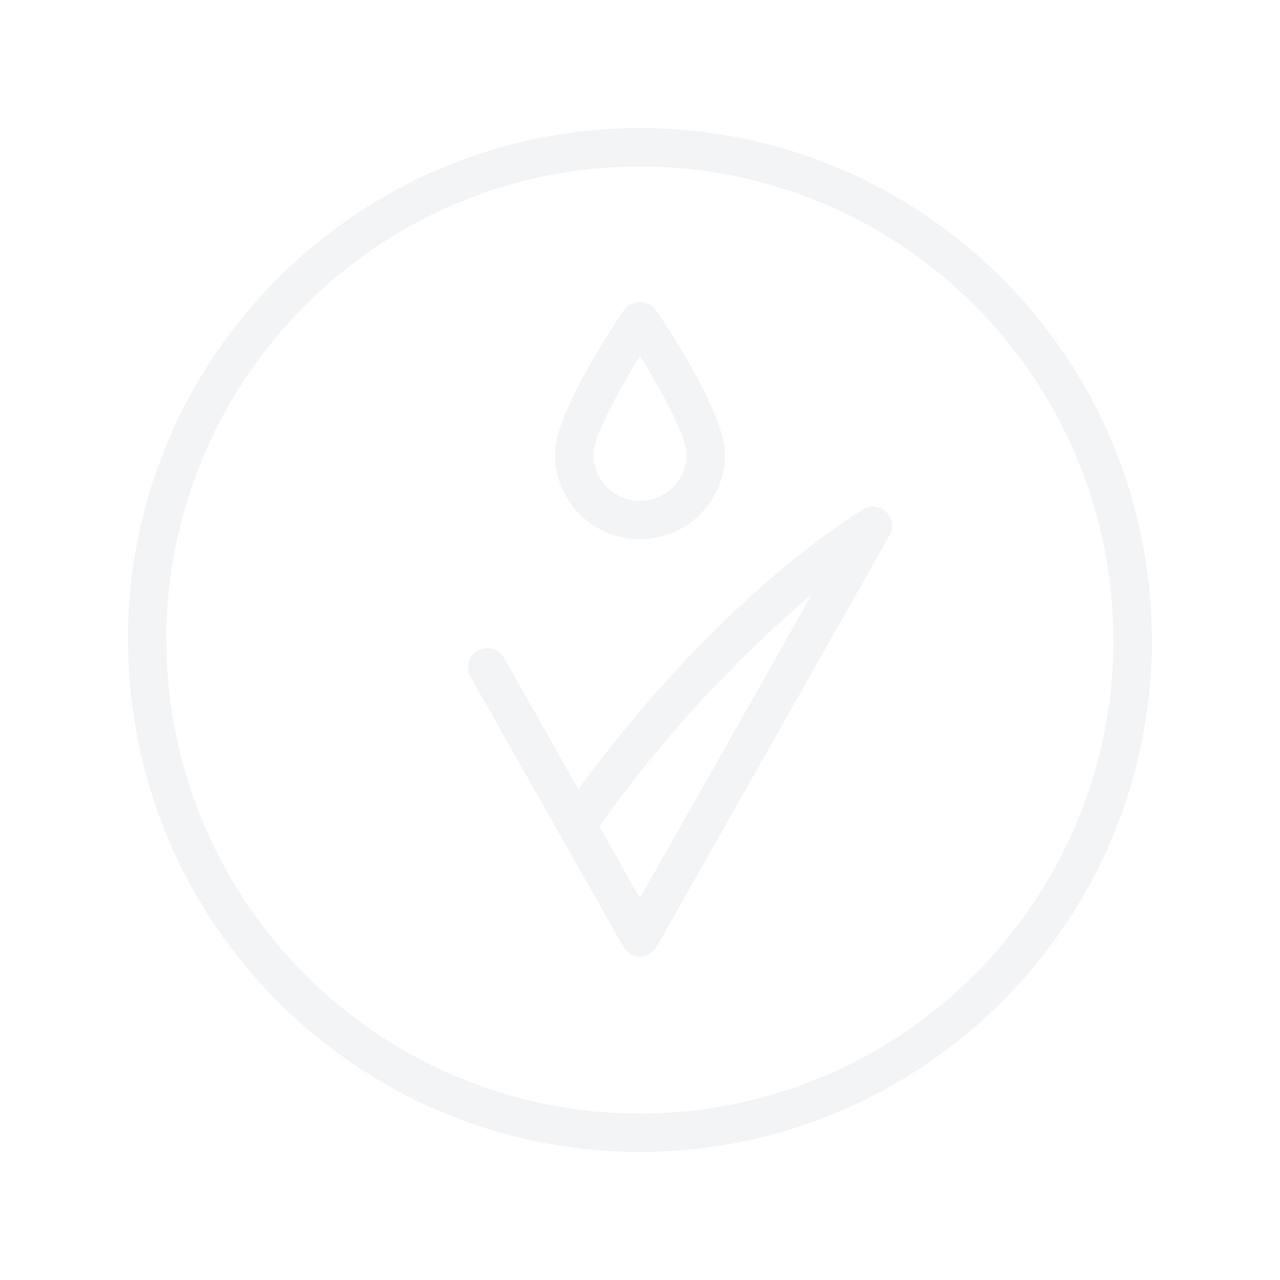 L'OREAL PROFESSIONNEL Serioxyl Clarifying Shampoo (Natural Hair) 250ml